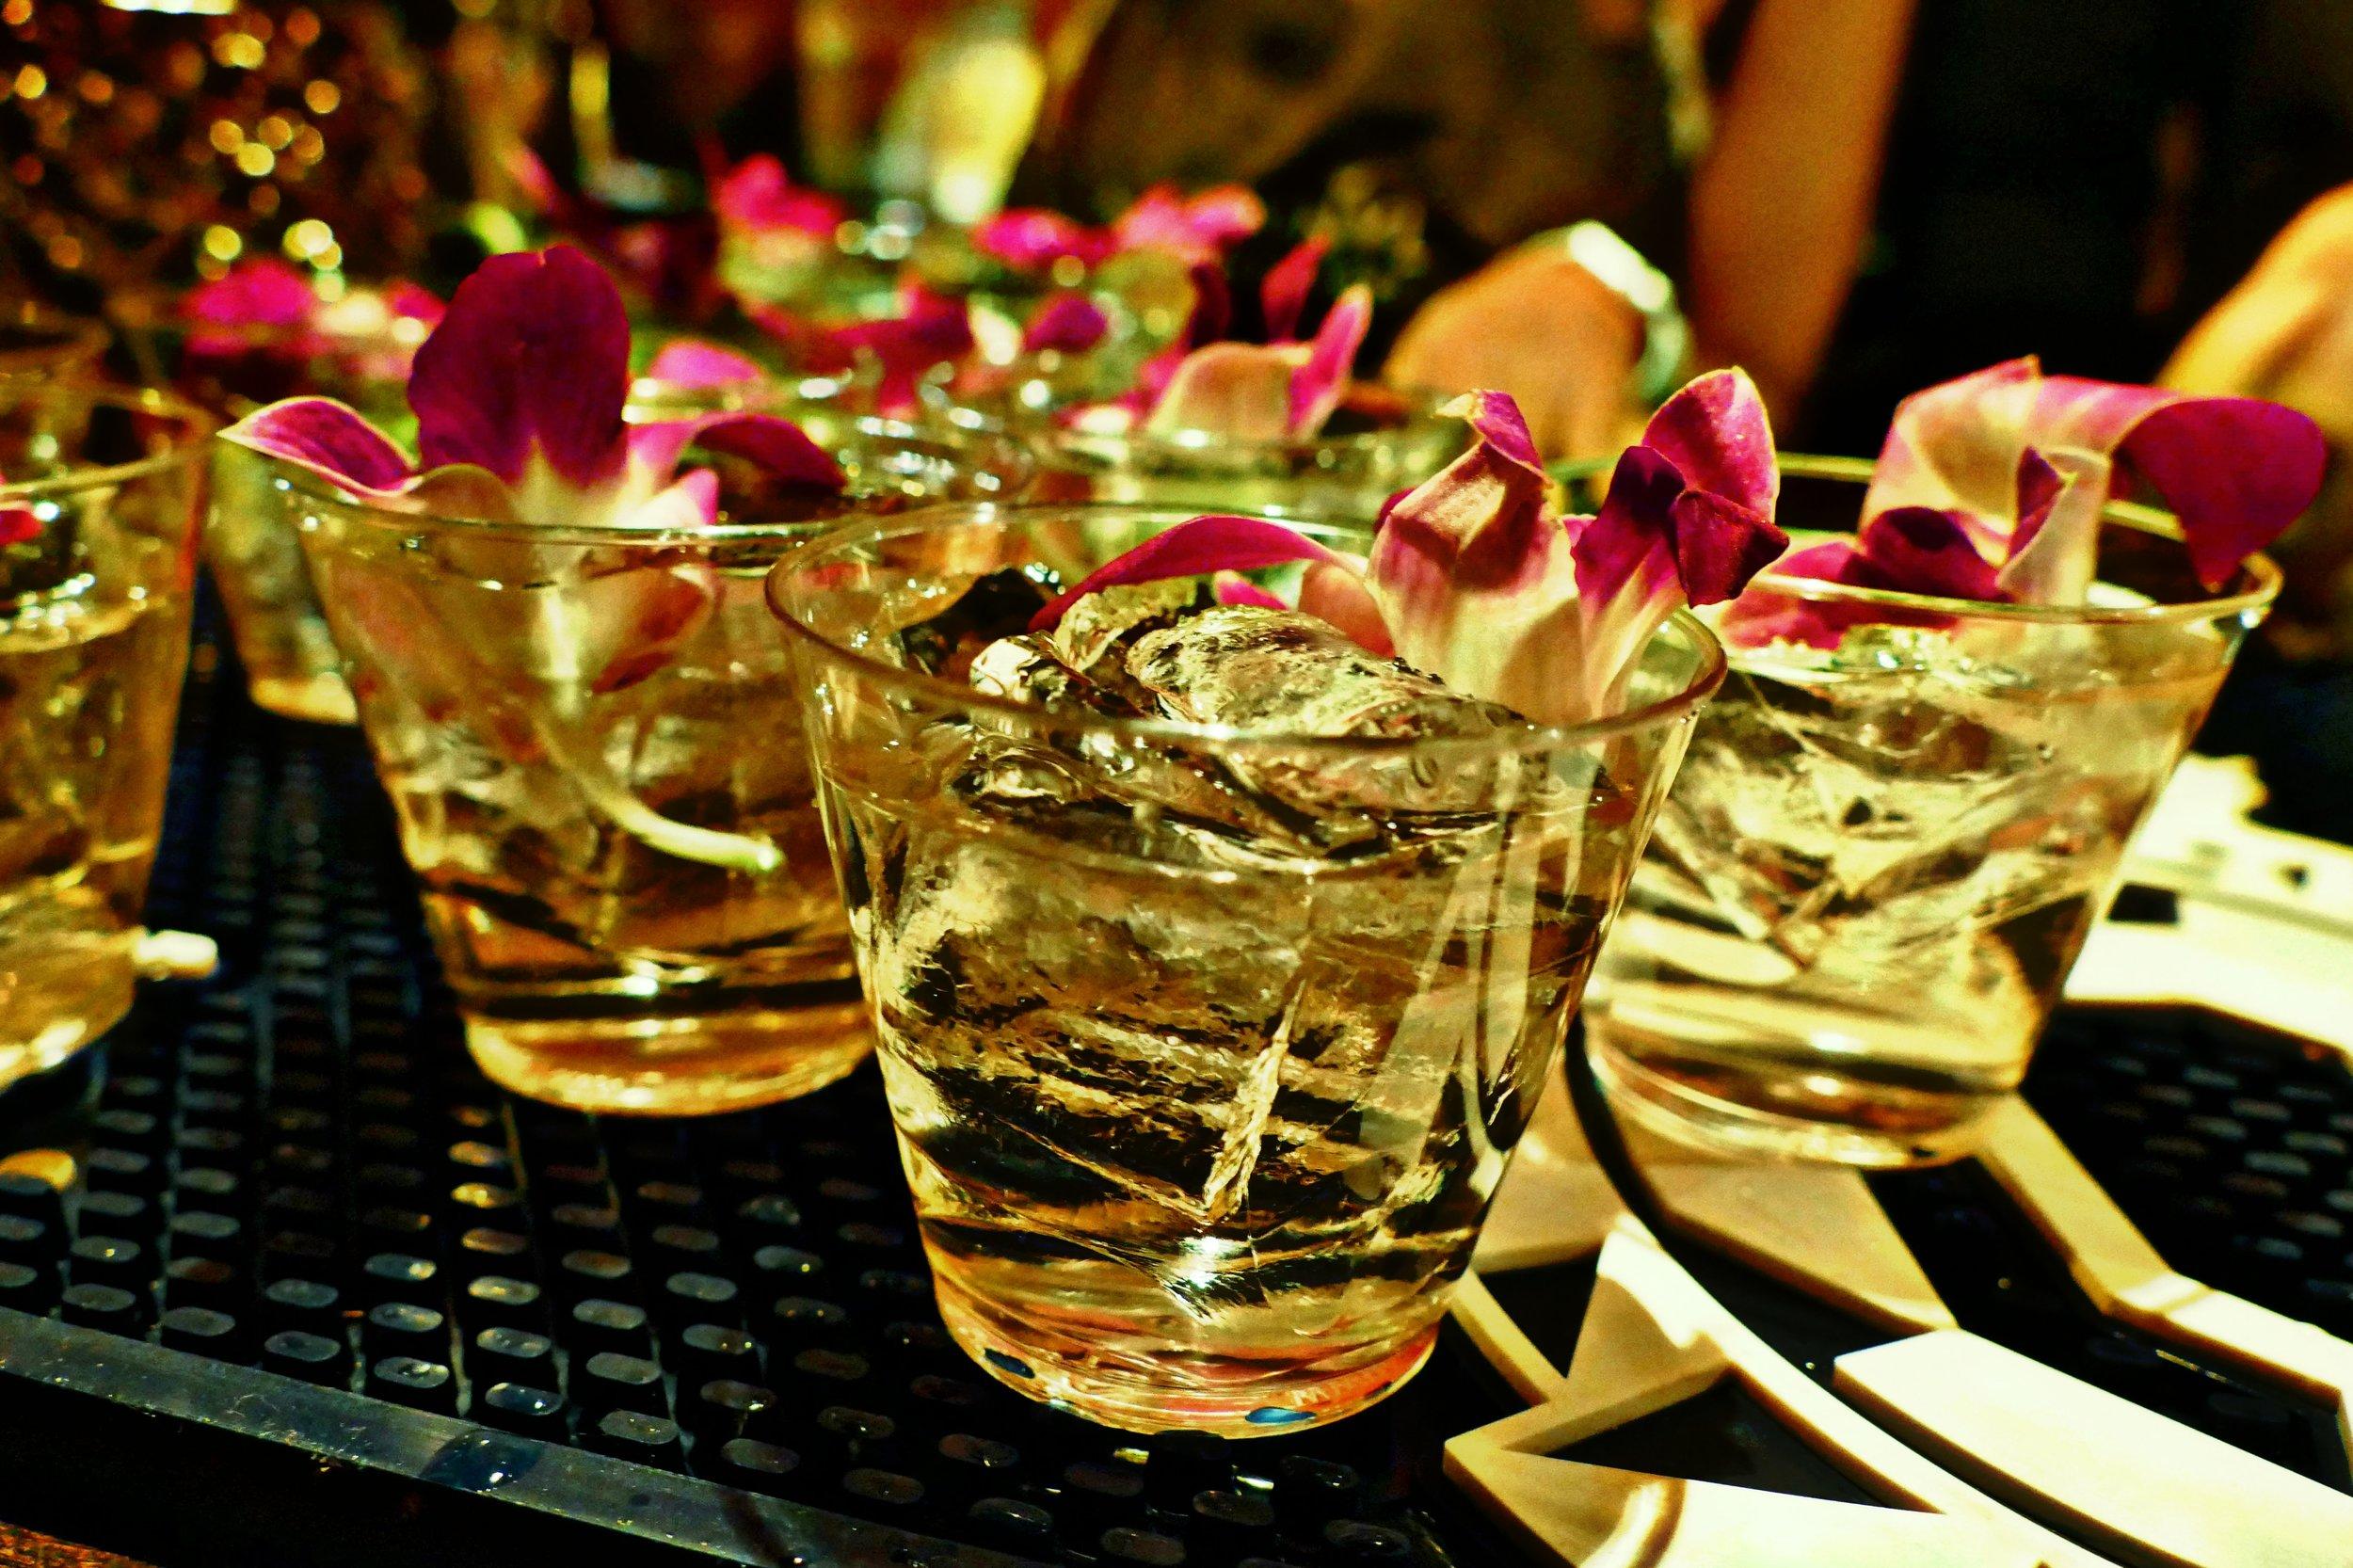 Gareth Howells, of THE VYNL, and the THE MONKEY'S ROOST: Bombay Sapphire® East Gin, St-Germain® Elderflower Liqueur, Dewar's 12 Year Old Scotch, Pineapple, Pink Grapefruit, Jalapeño, Cardamom, Canella, Coriander, Star Anise, Earl Grey Tea, Sencha Green Tea, Milk, Demerara, Orchid Garnish